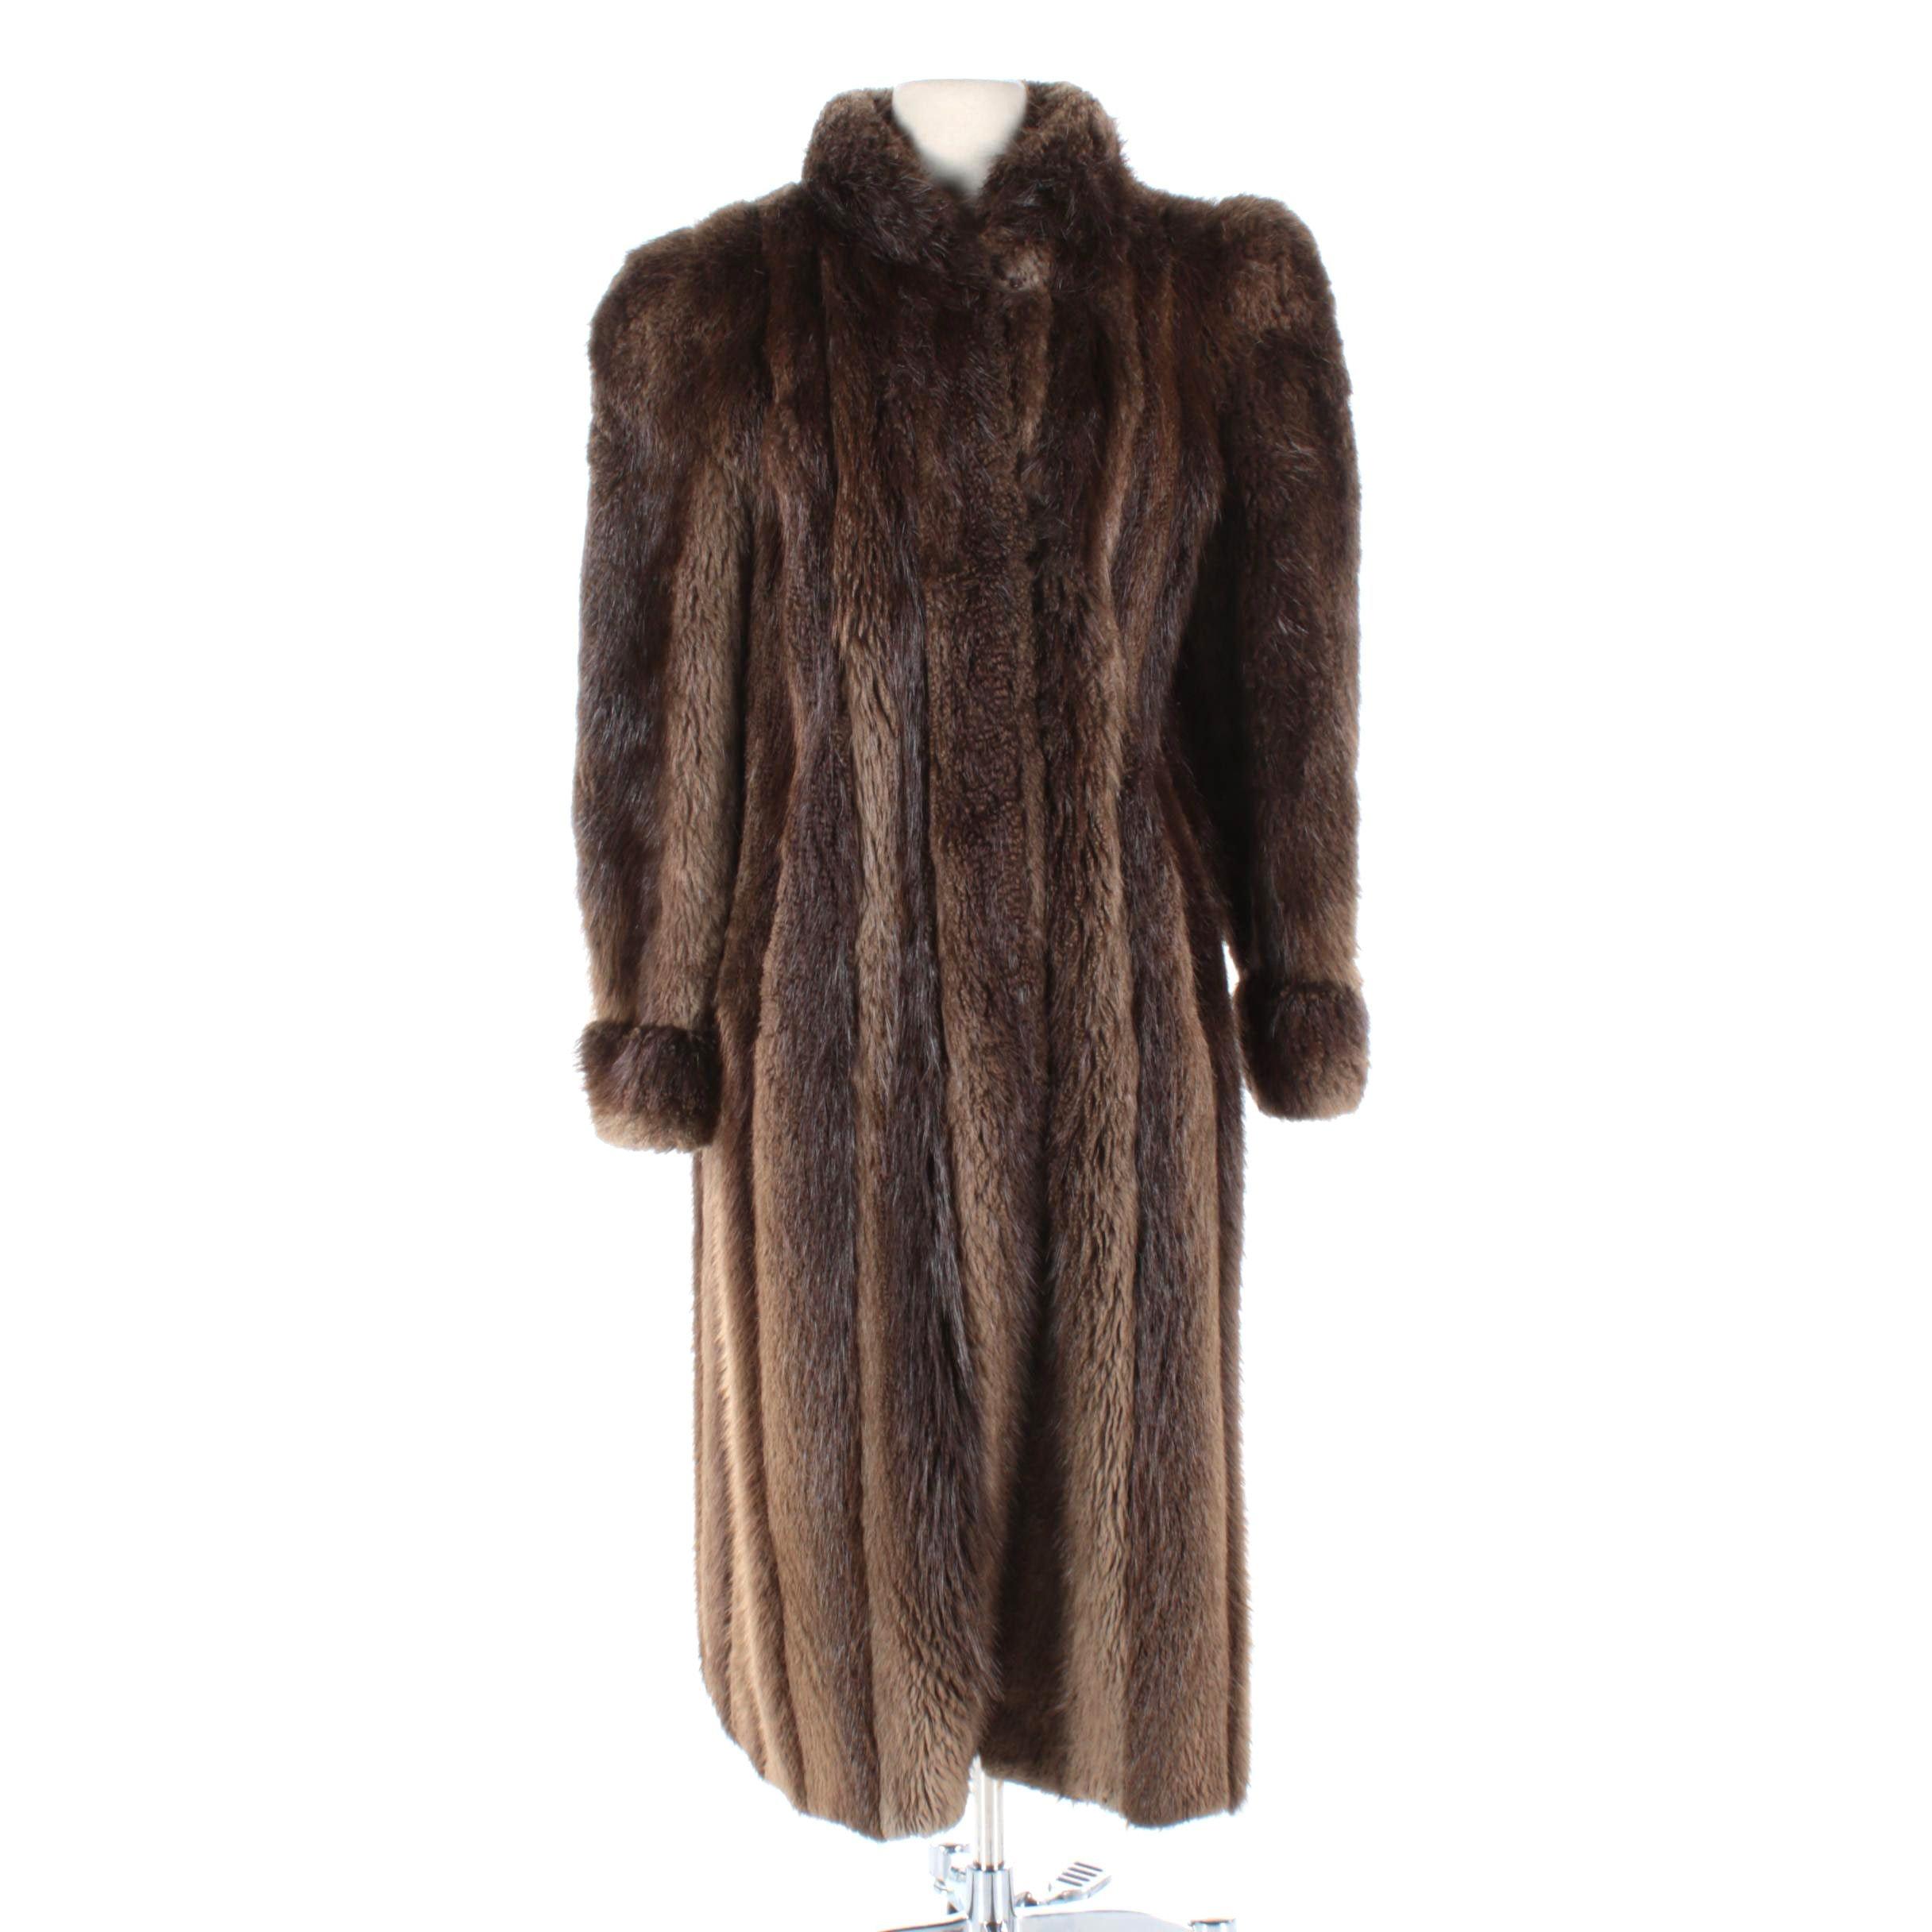 Women's Vintage Beaver Fur Coat